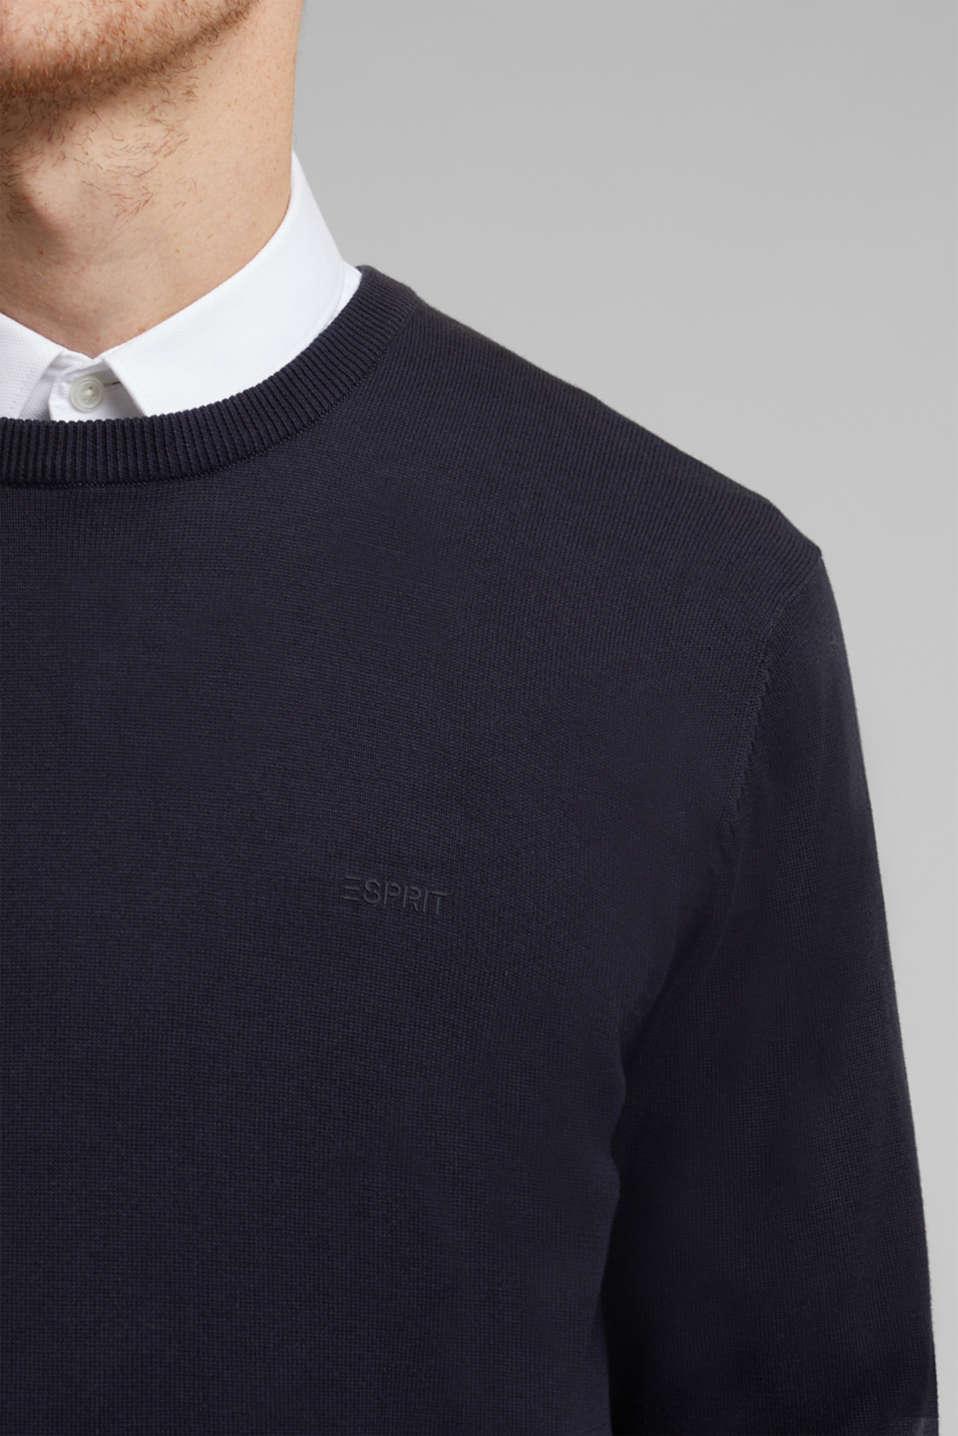 Jumper with a round neckline, 100% cotton, NAVY, detail image number 2